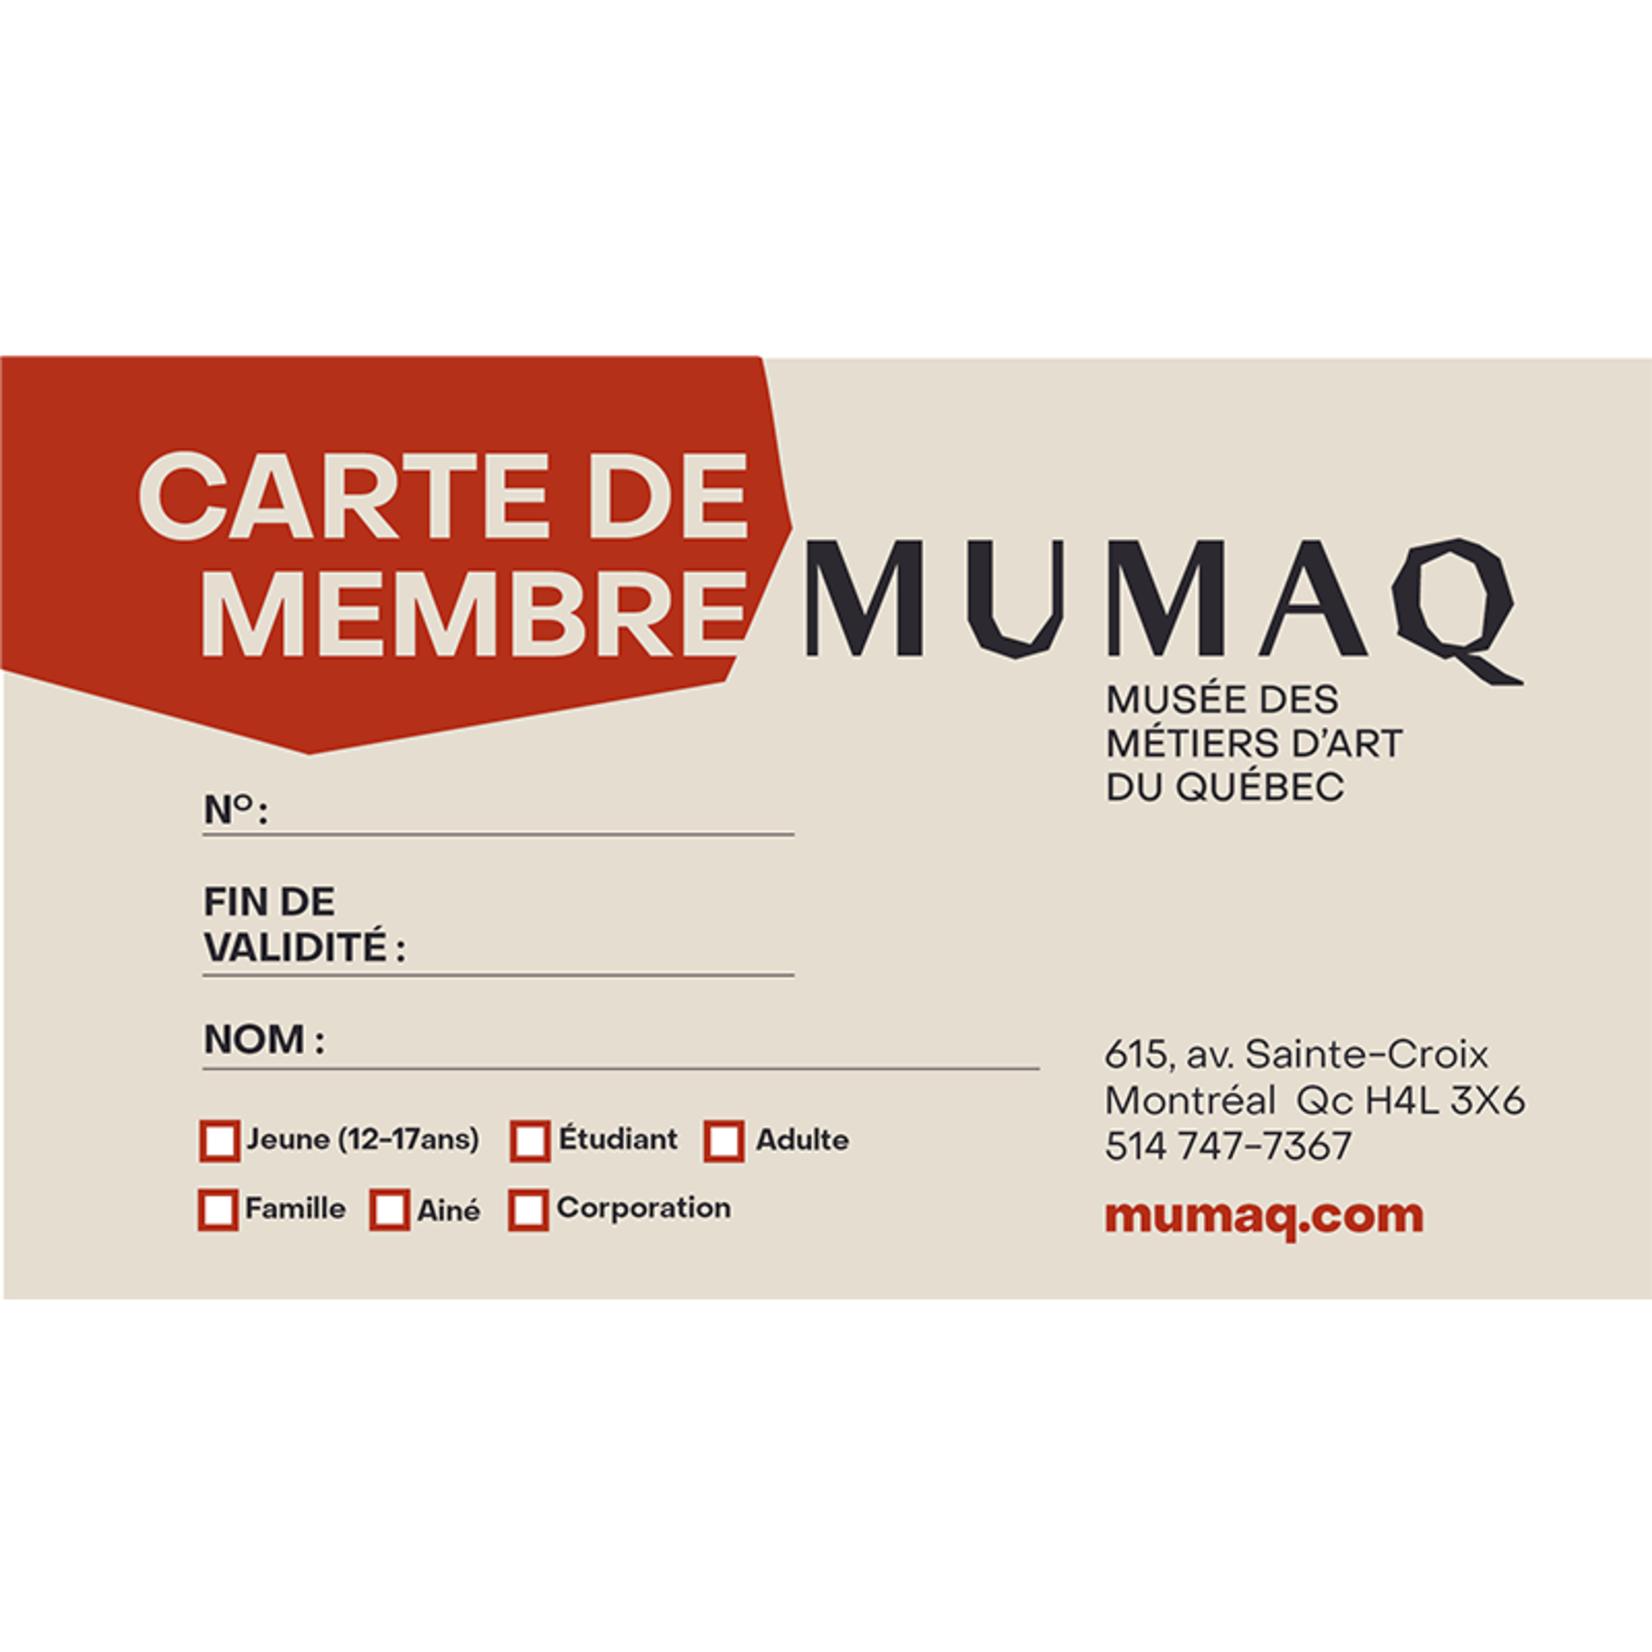 1 year membership card - Youth (12 to 17)